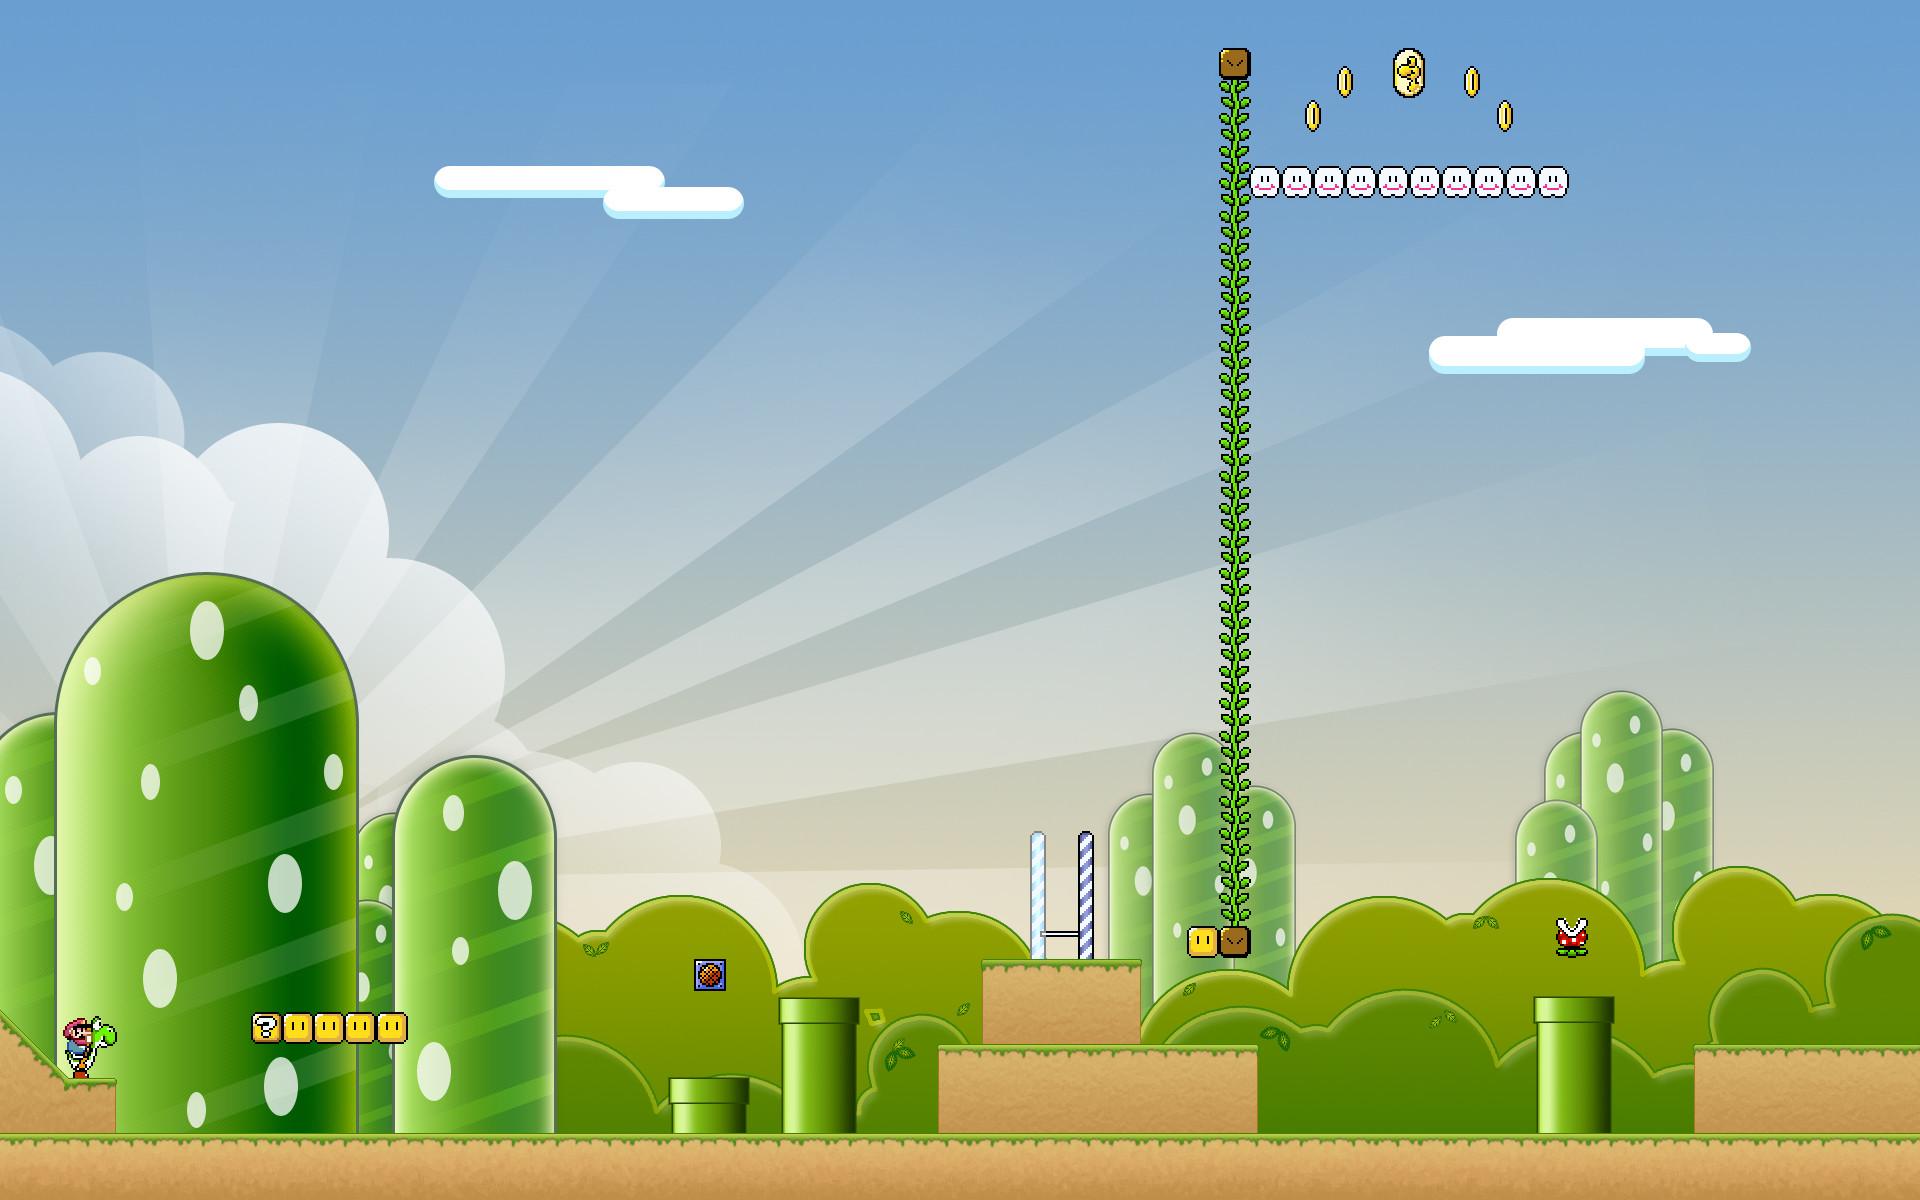 Super Mario Wallpaper | HD Wallpapers | Pinterest | Mario and Wallpaper